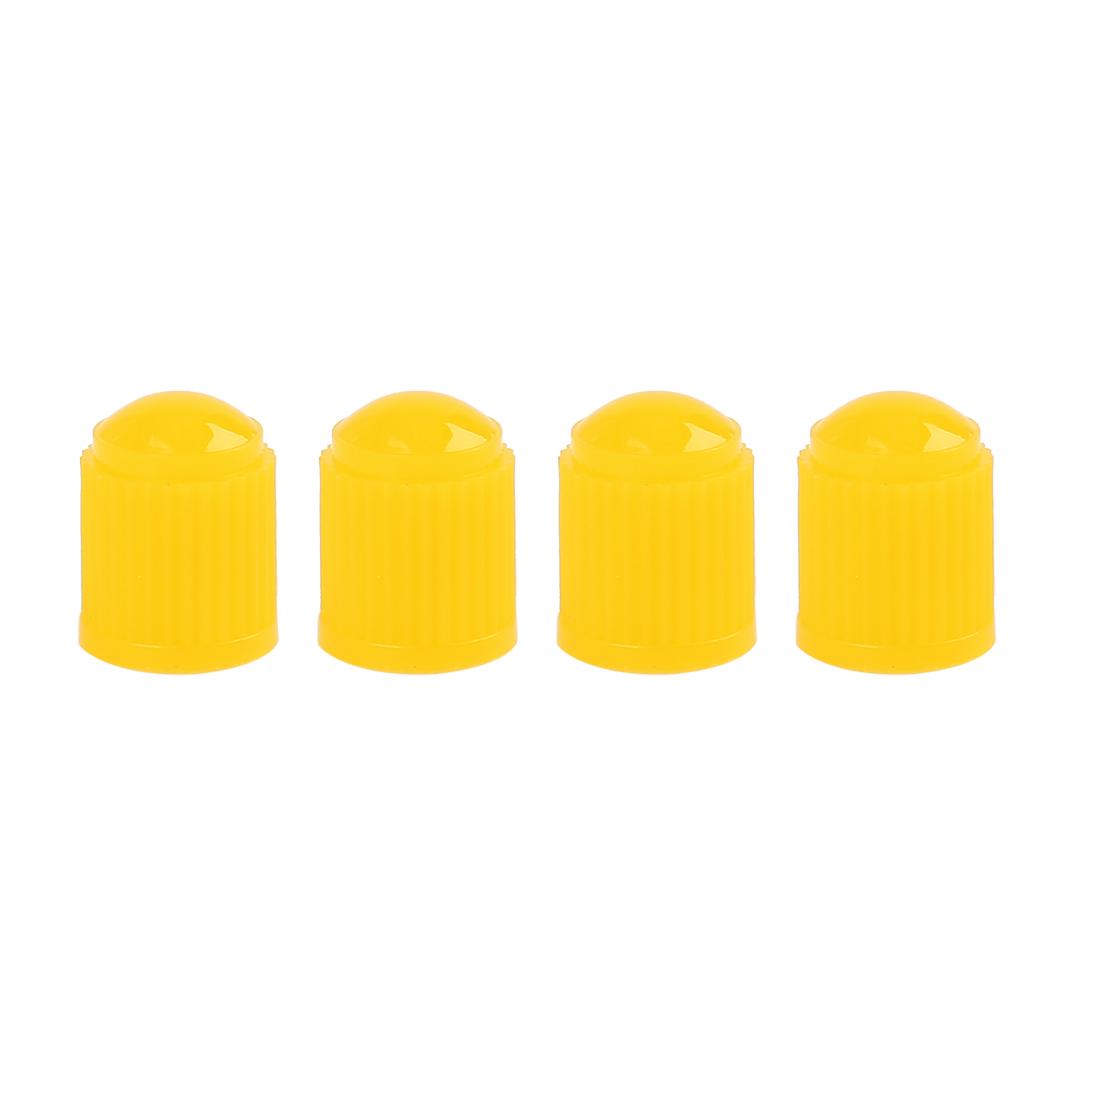 4pcs Yellow Plastic Universal Tire Valve Stem Cap Cover for Motorcycle Bike Car